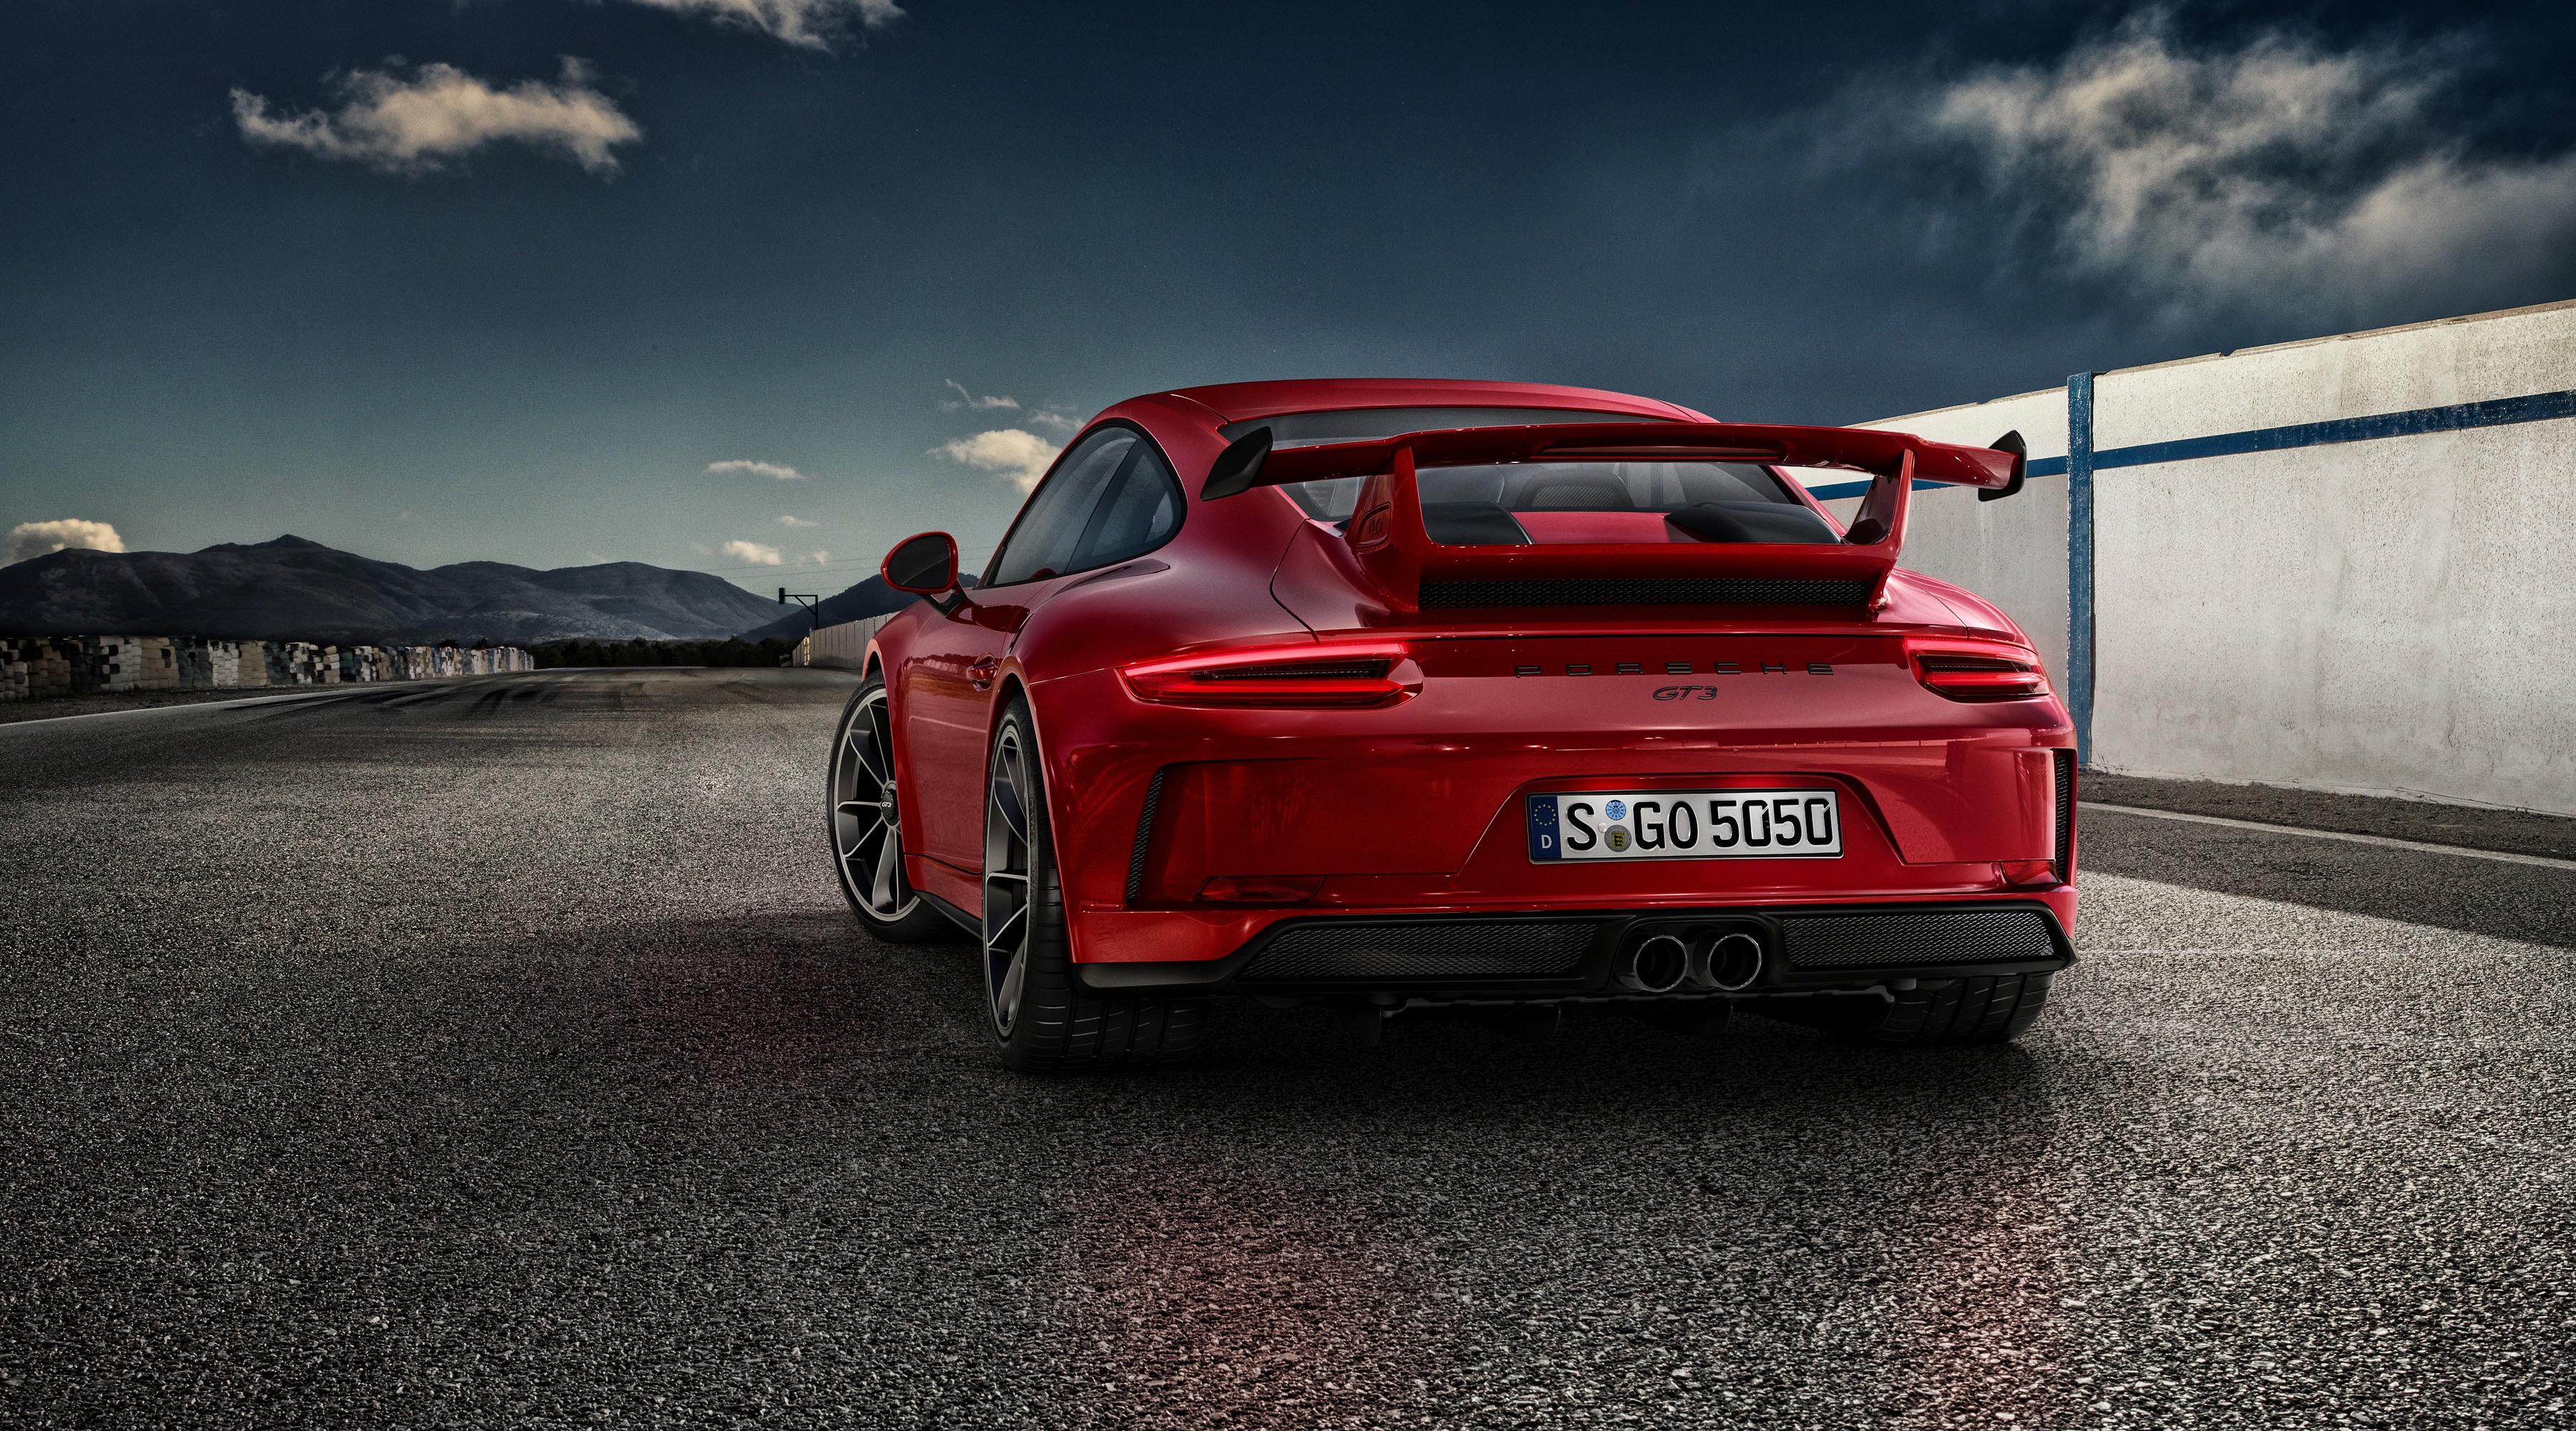 Porsche 911 GT3 HD Wallpaper Background Image 3600x2000 ID 3600x2000